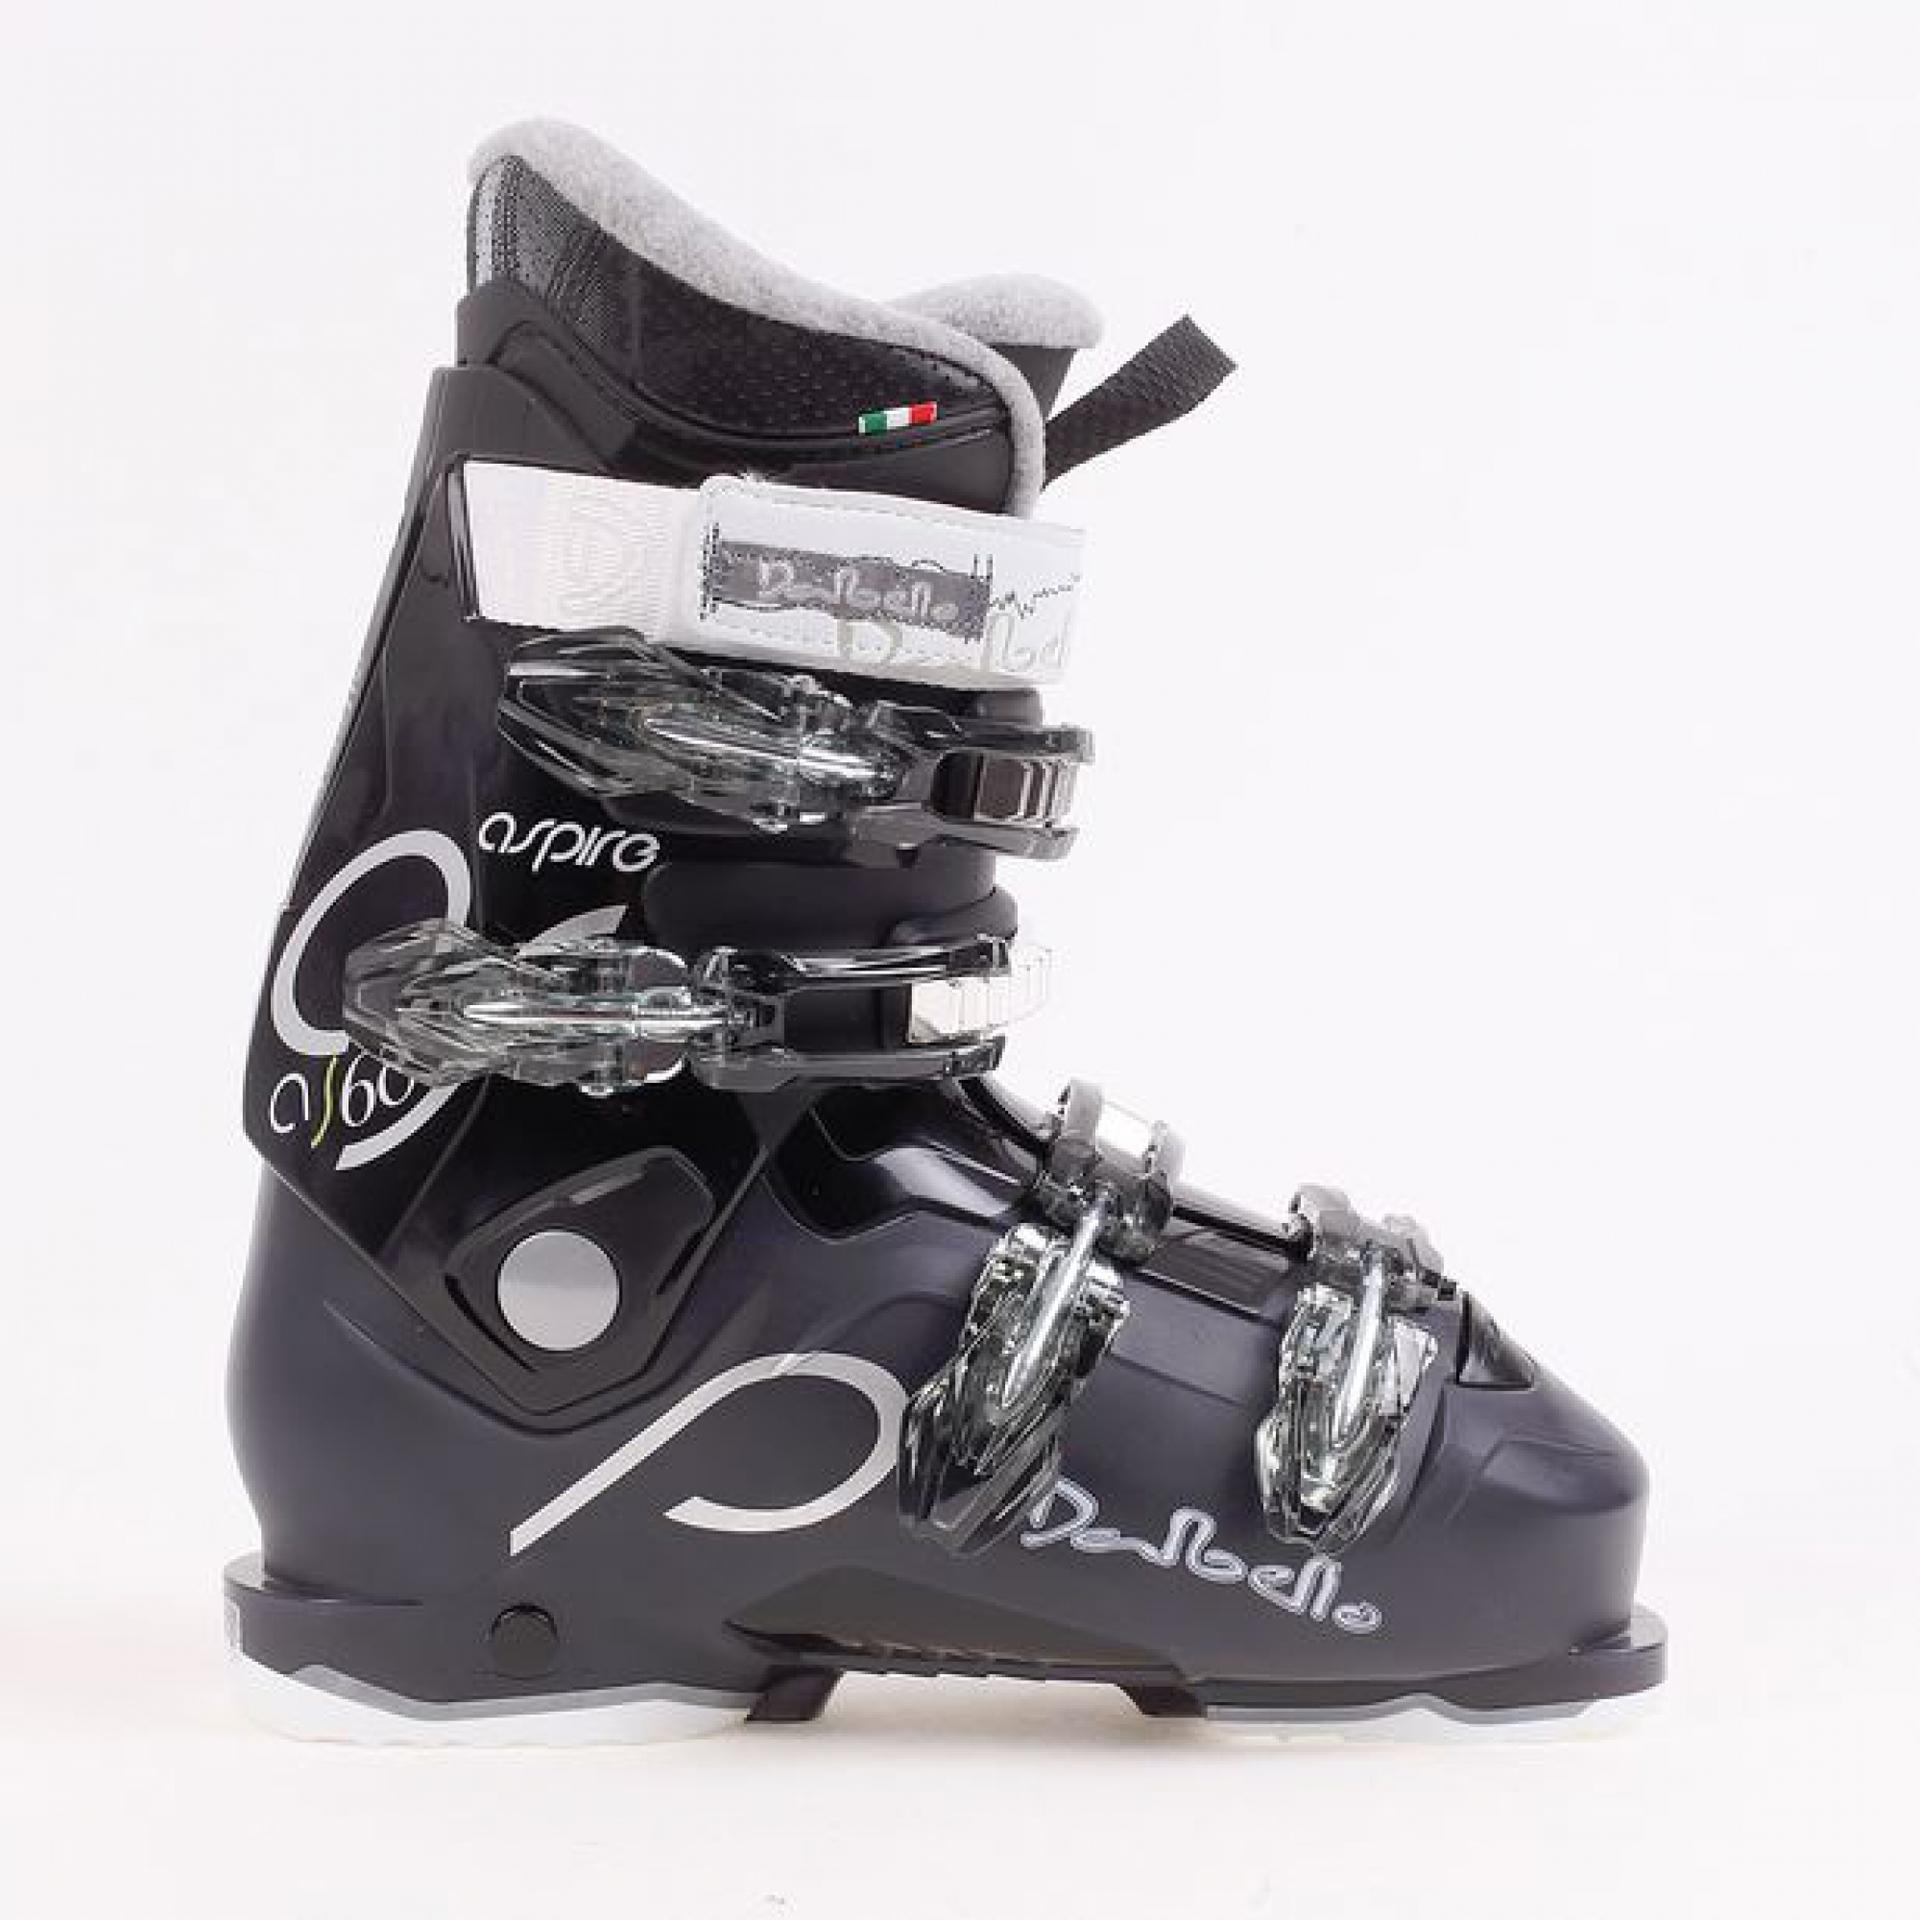 Buty narciarskie Dalbello Aspire 60 czarne